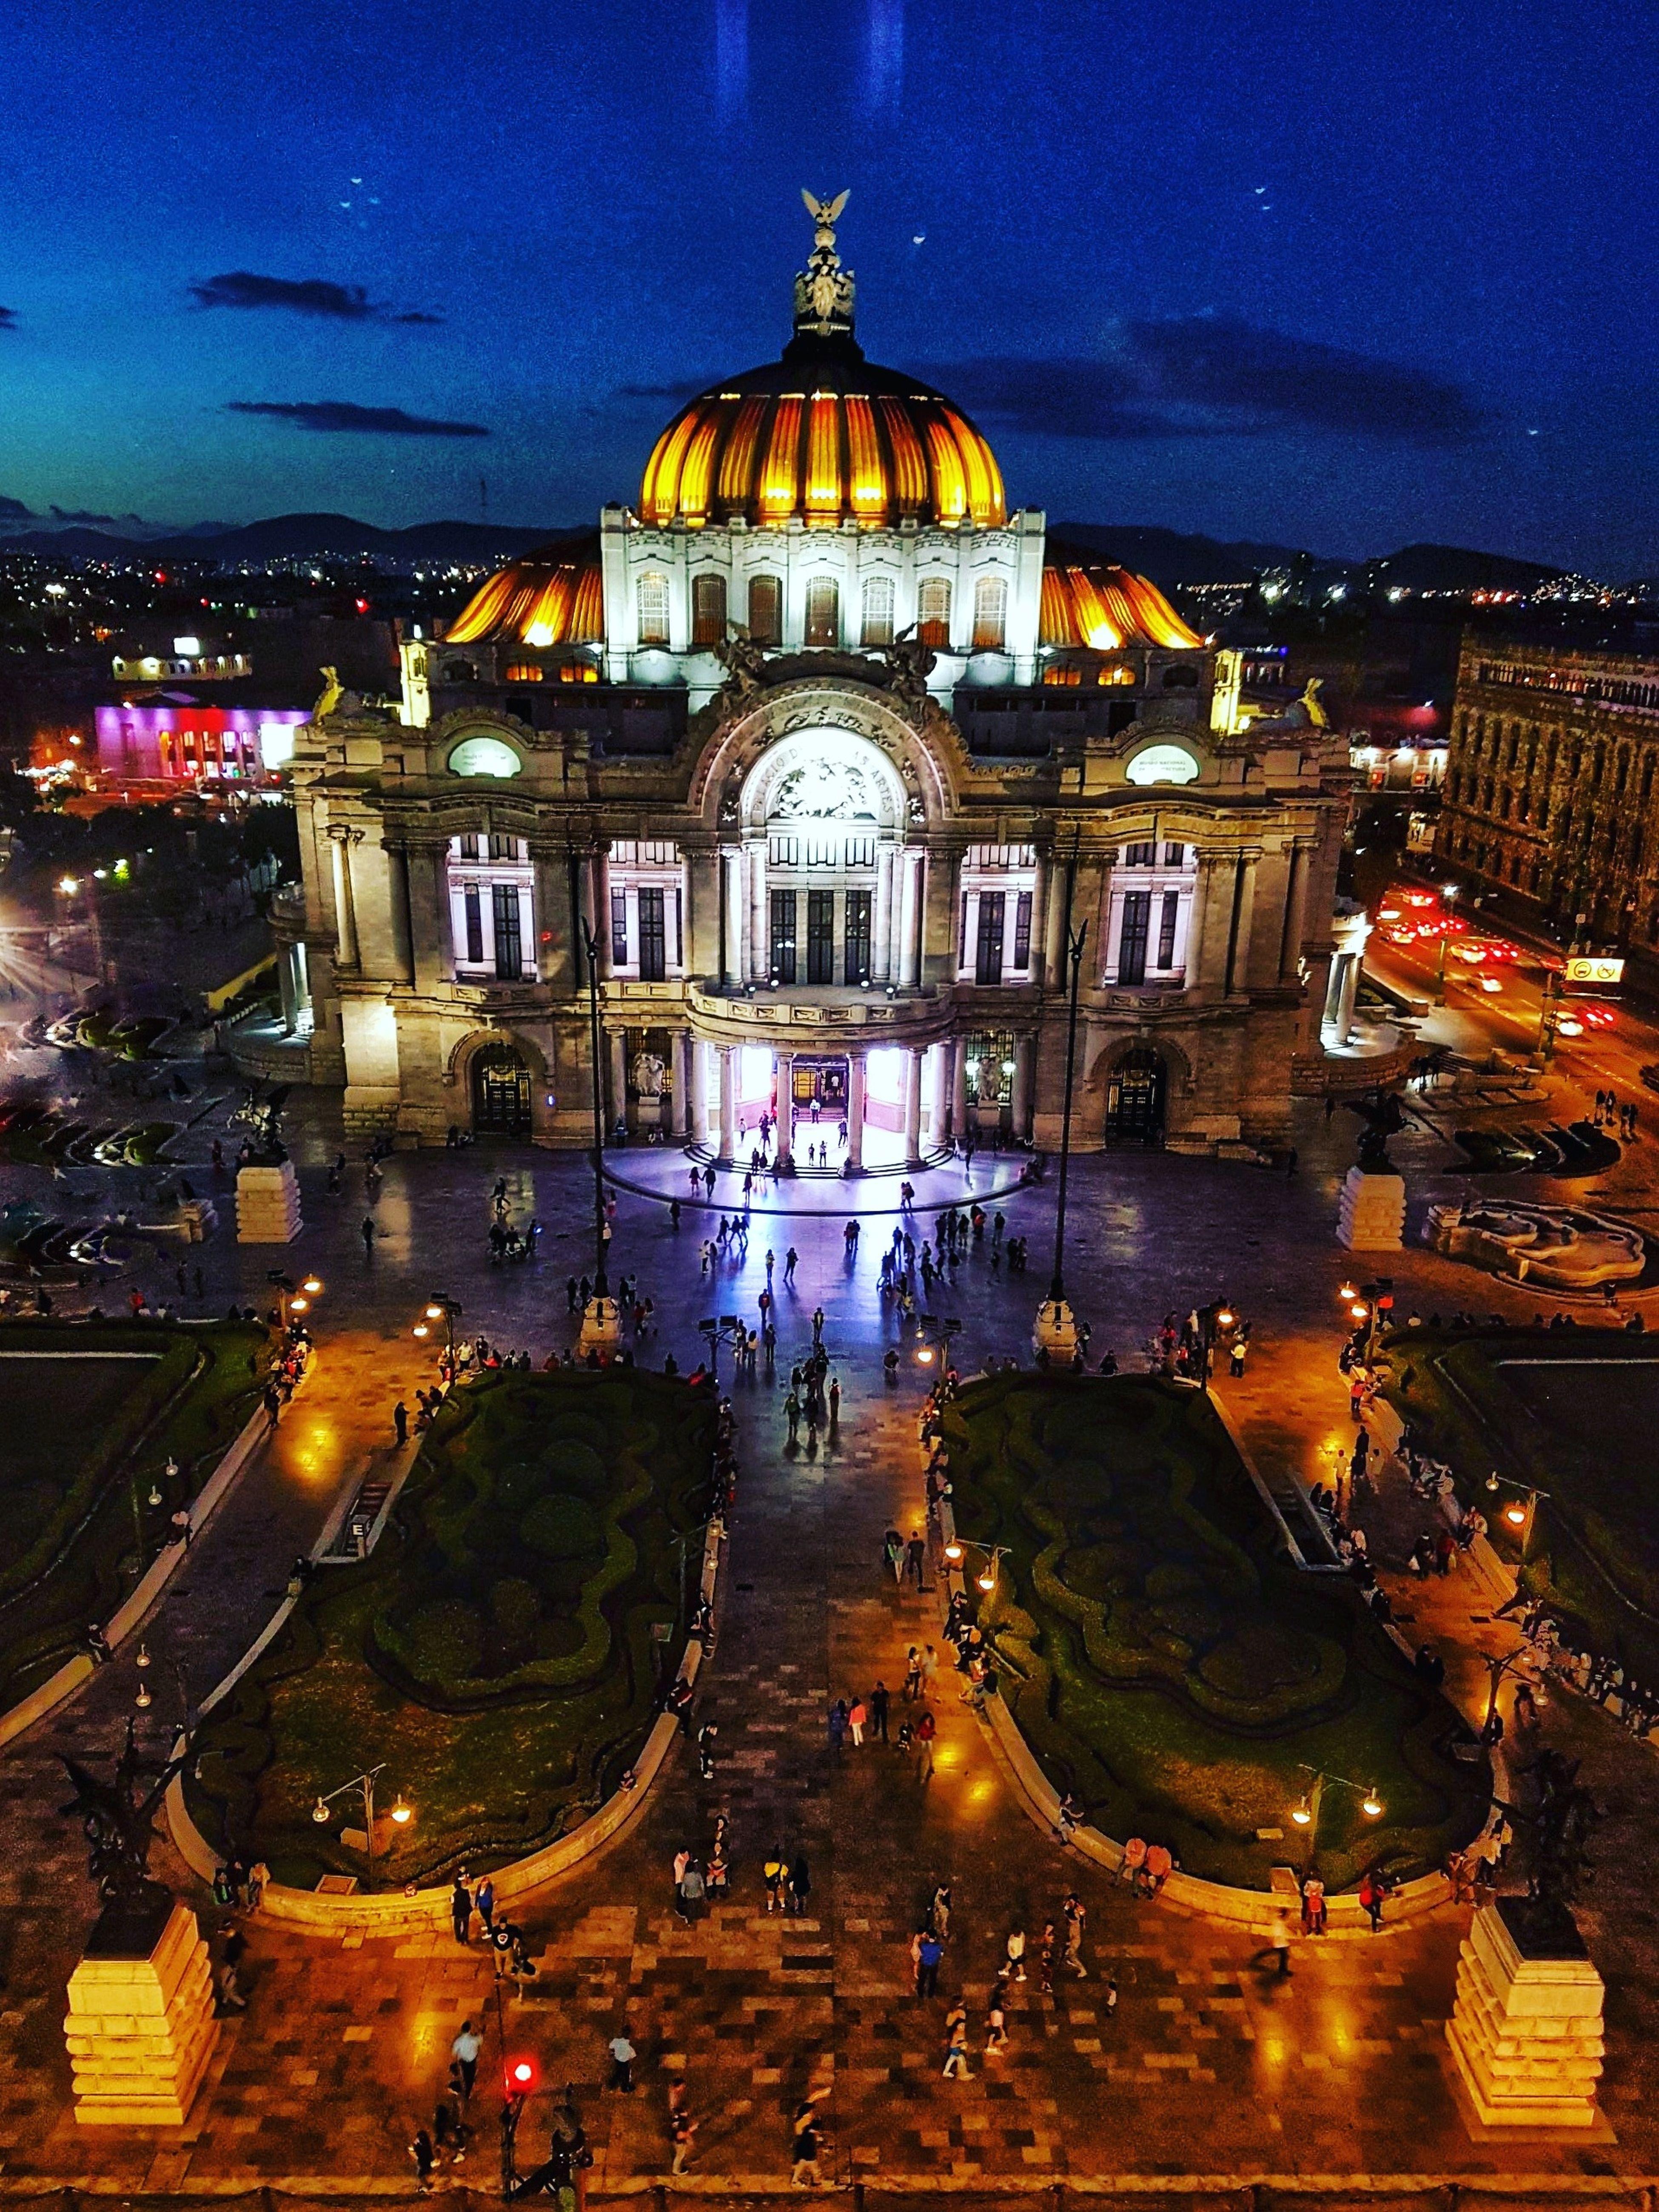 Night Car Illuminated Outdoors City No People Building Exterior Architecture Close-up CDMX ❤ Bellas Artes, México D.F. Architecture